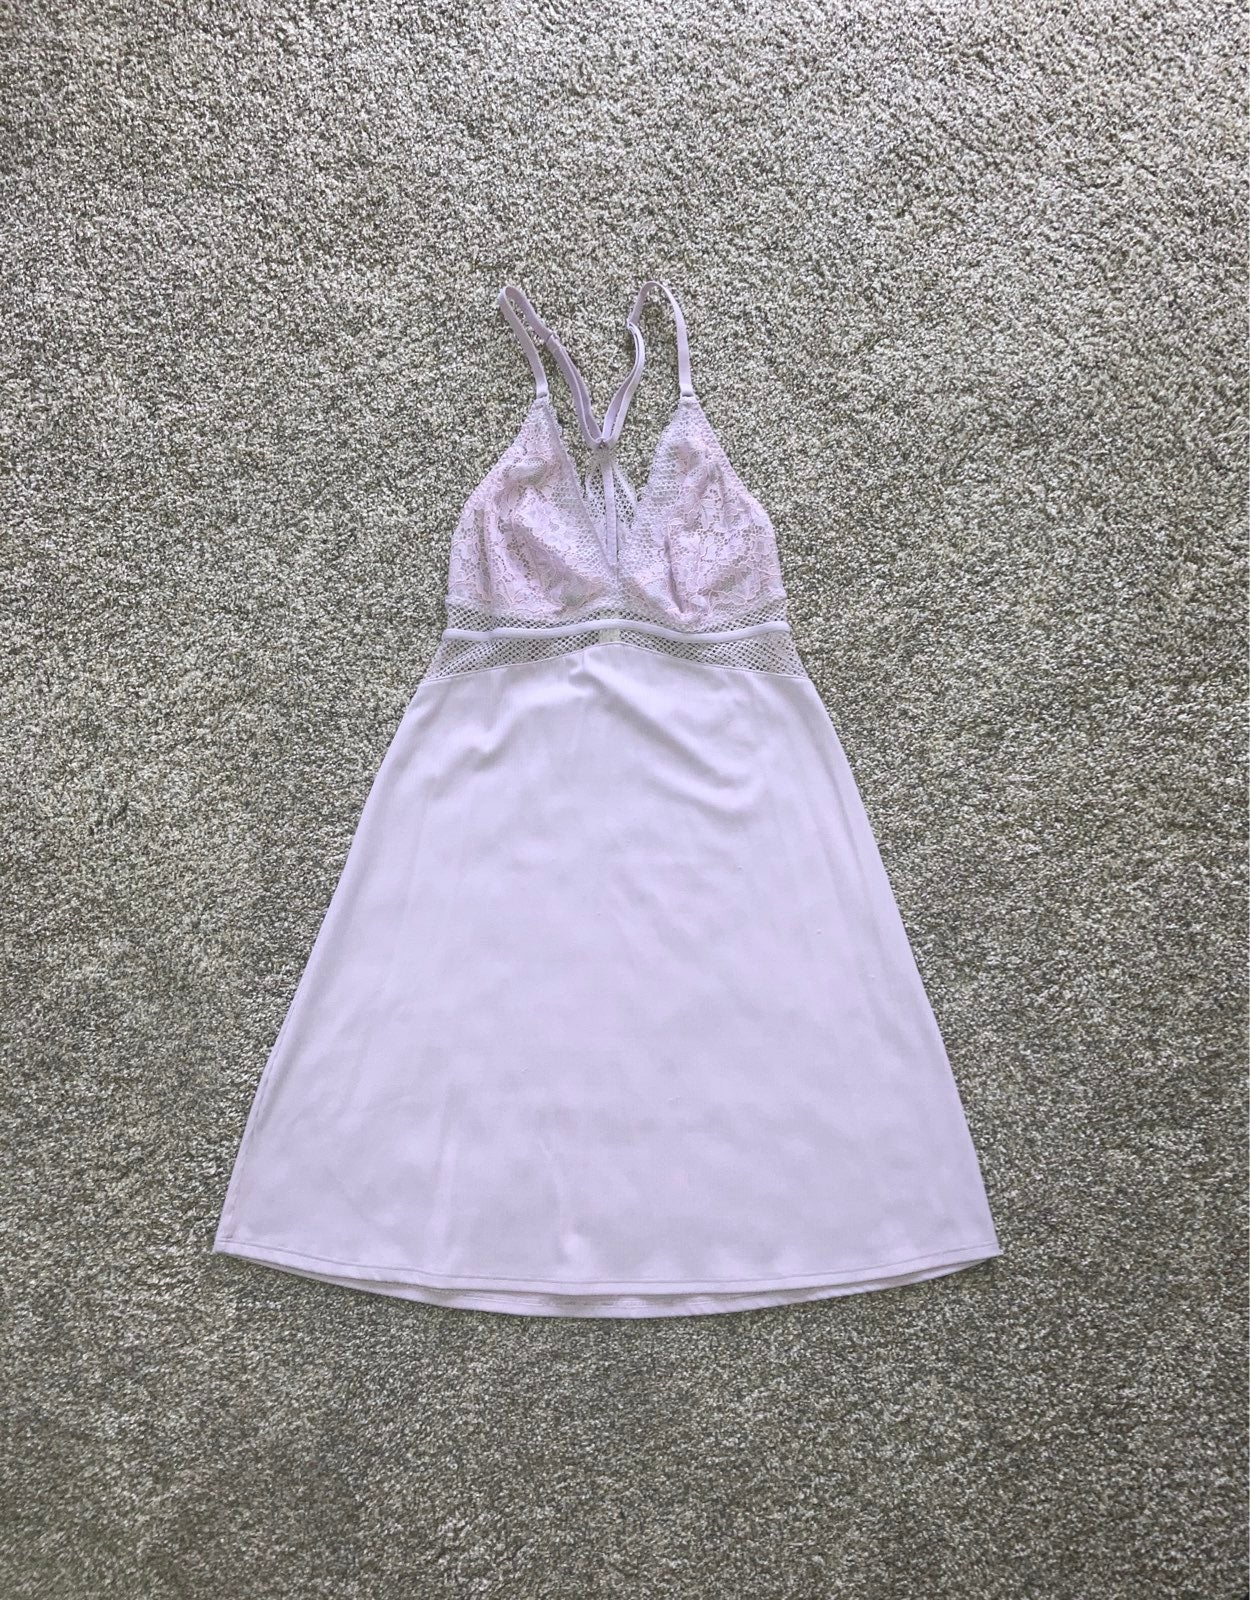 Sleep gown dress